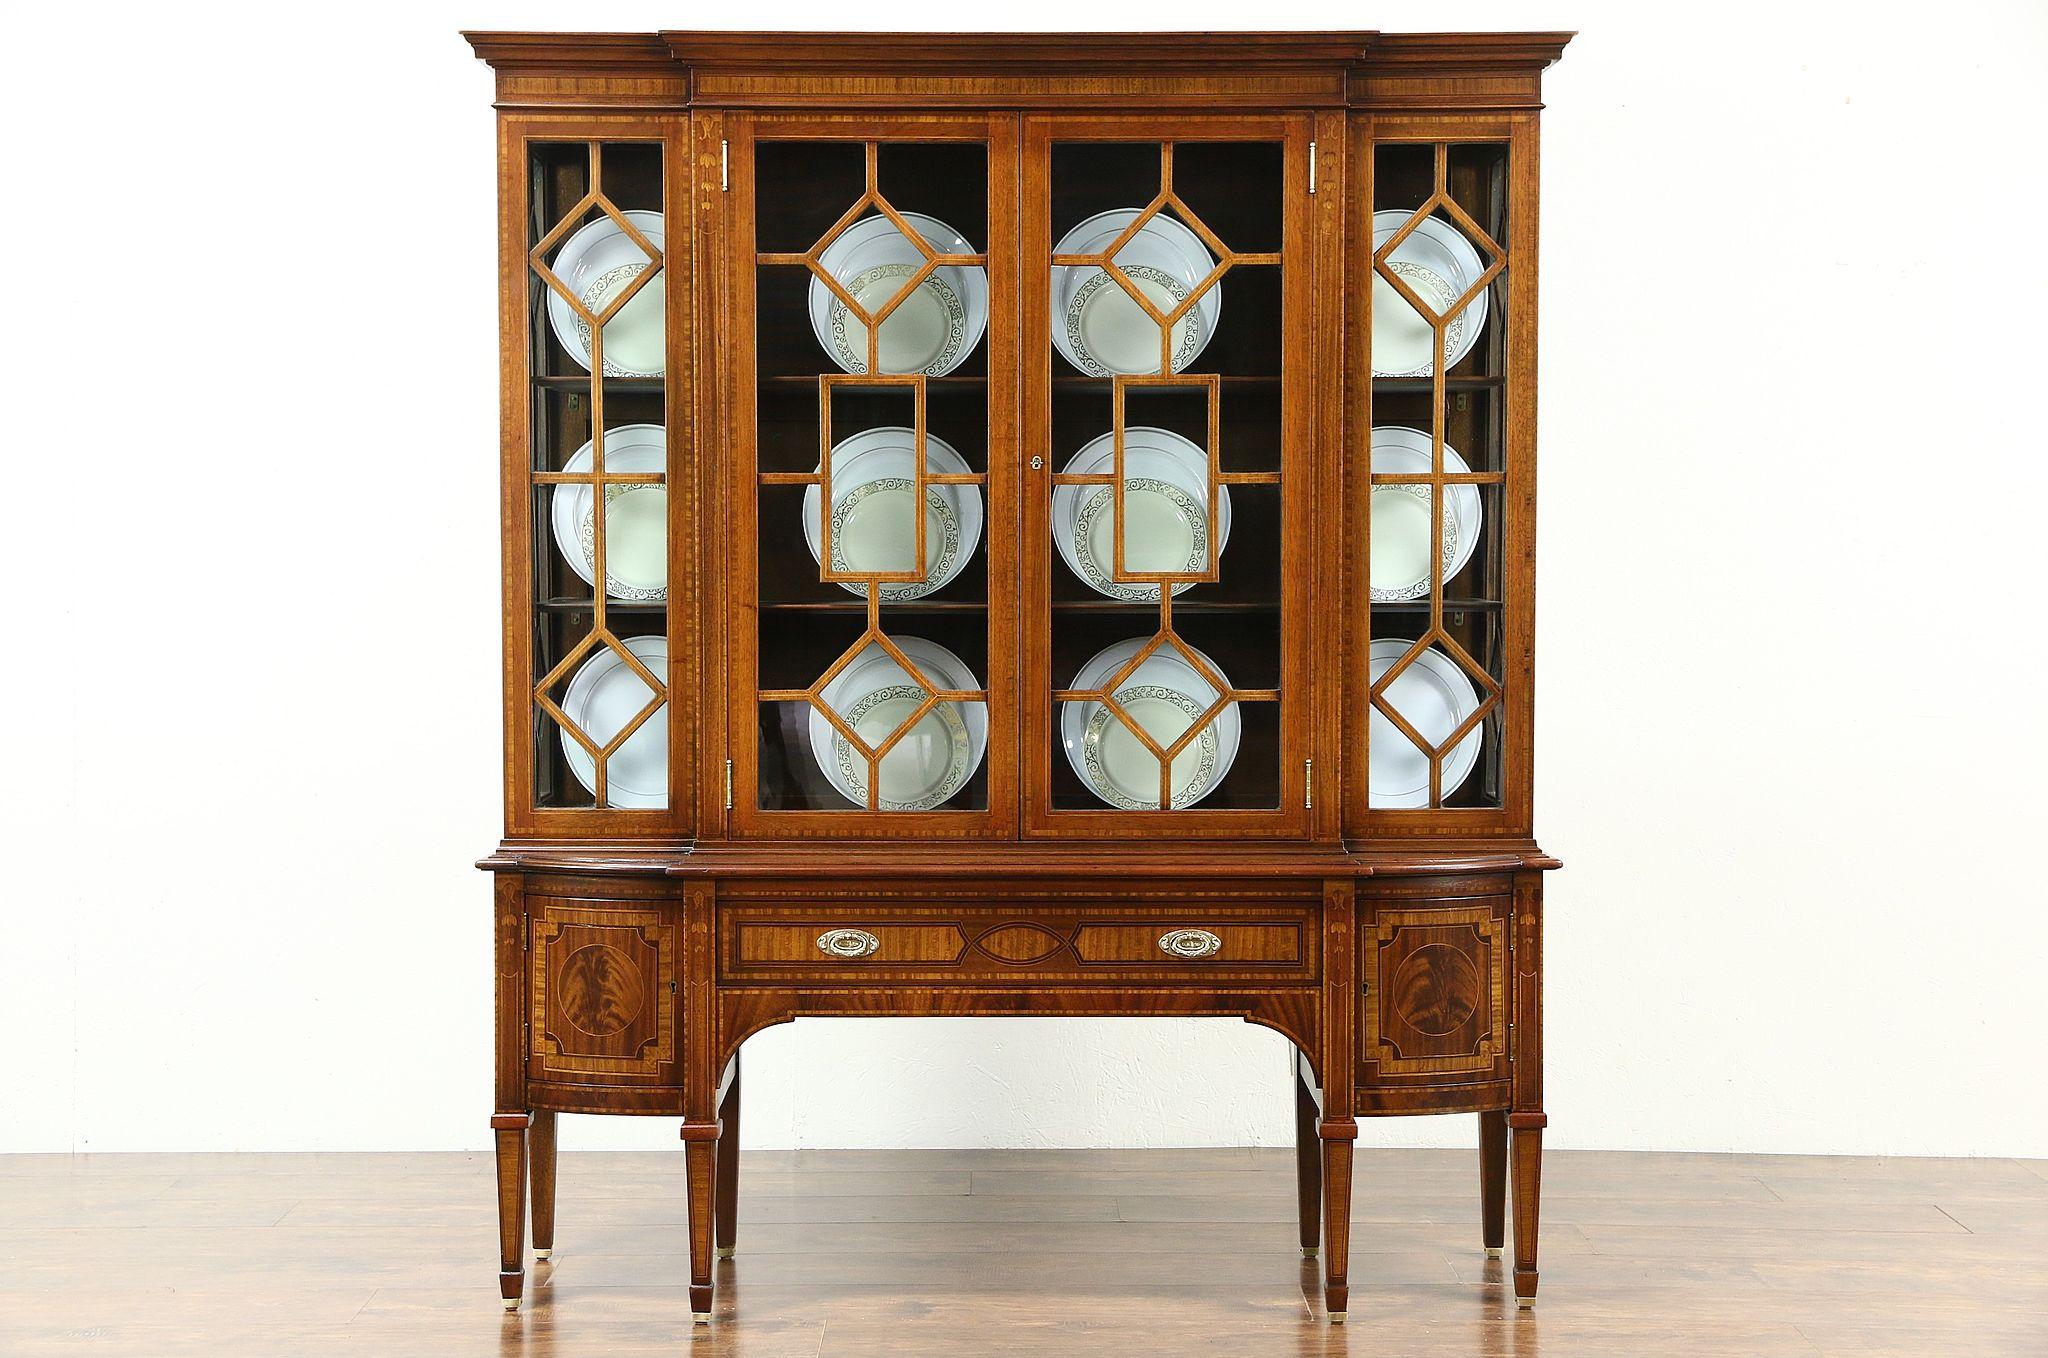 Berkey U0026 Gay Signed 1920u0027s Vintage China Curio Display Cabinet, Inlaid  Marquetry ...